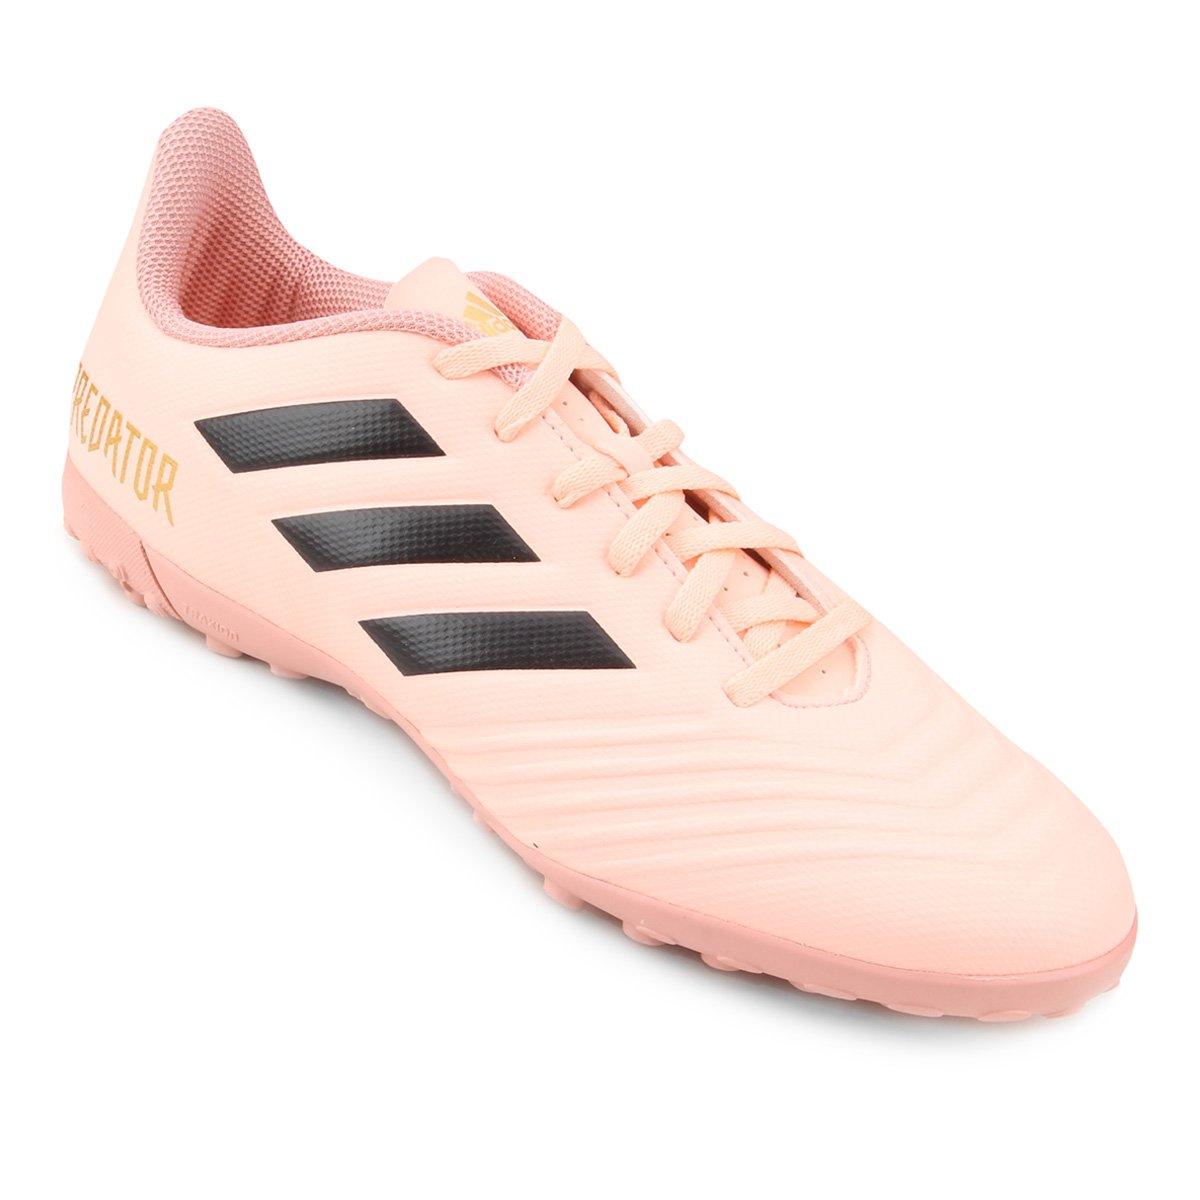 afijo pista Crítica  Chuteira Society Adidas Predator Tan 18 4 TF - Rosa e Preto | Netshoes